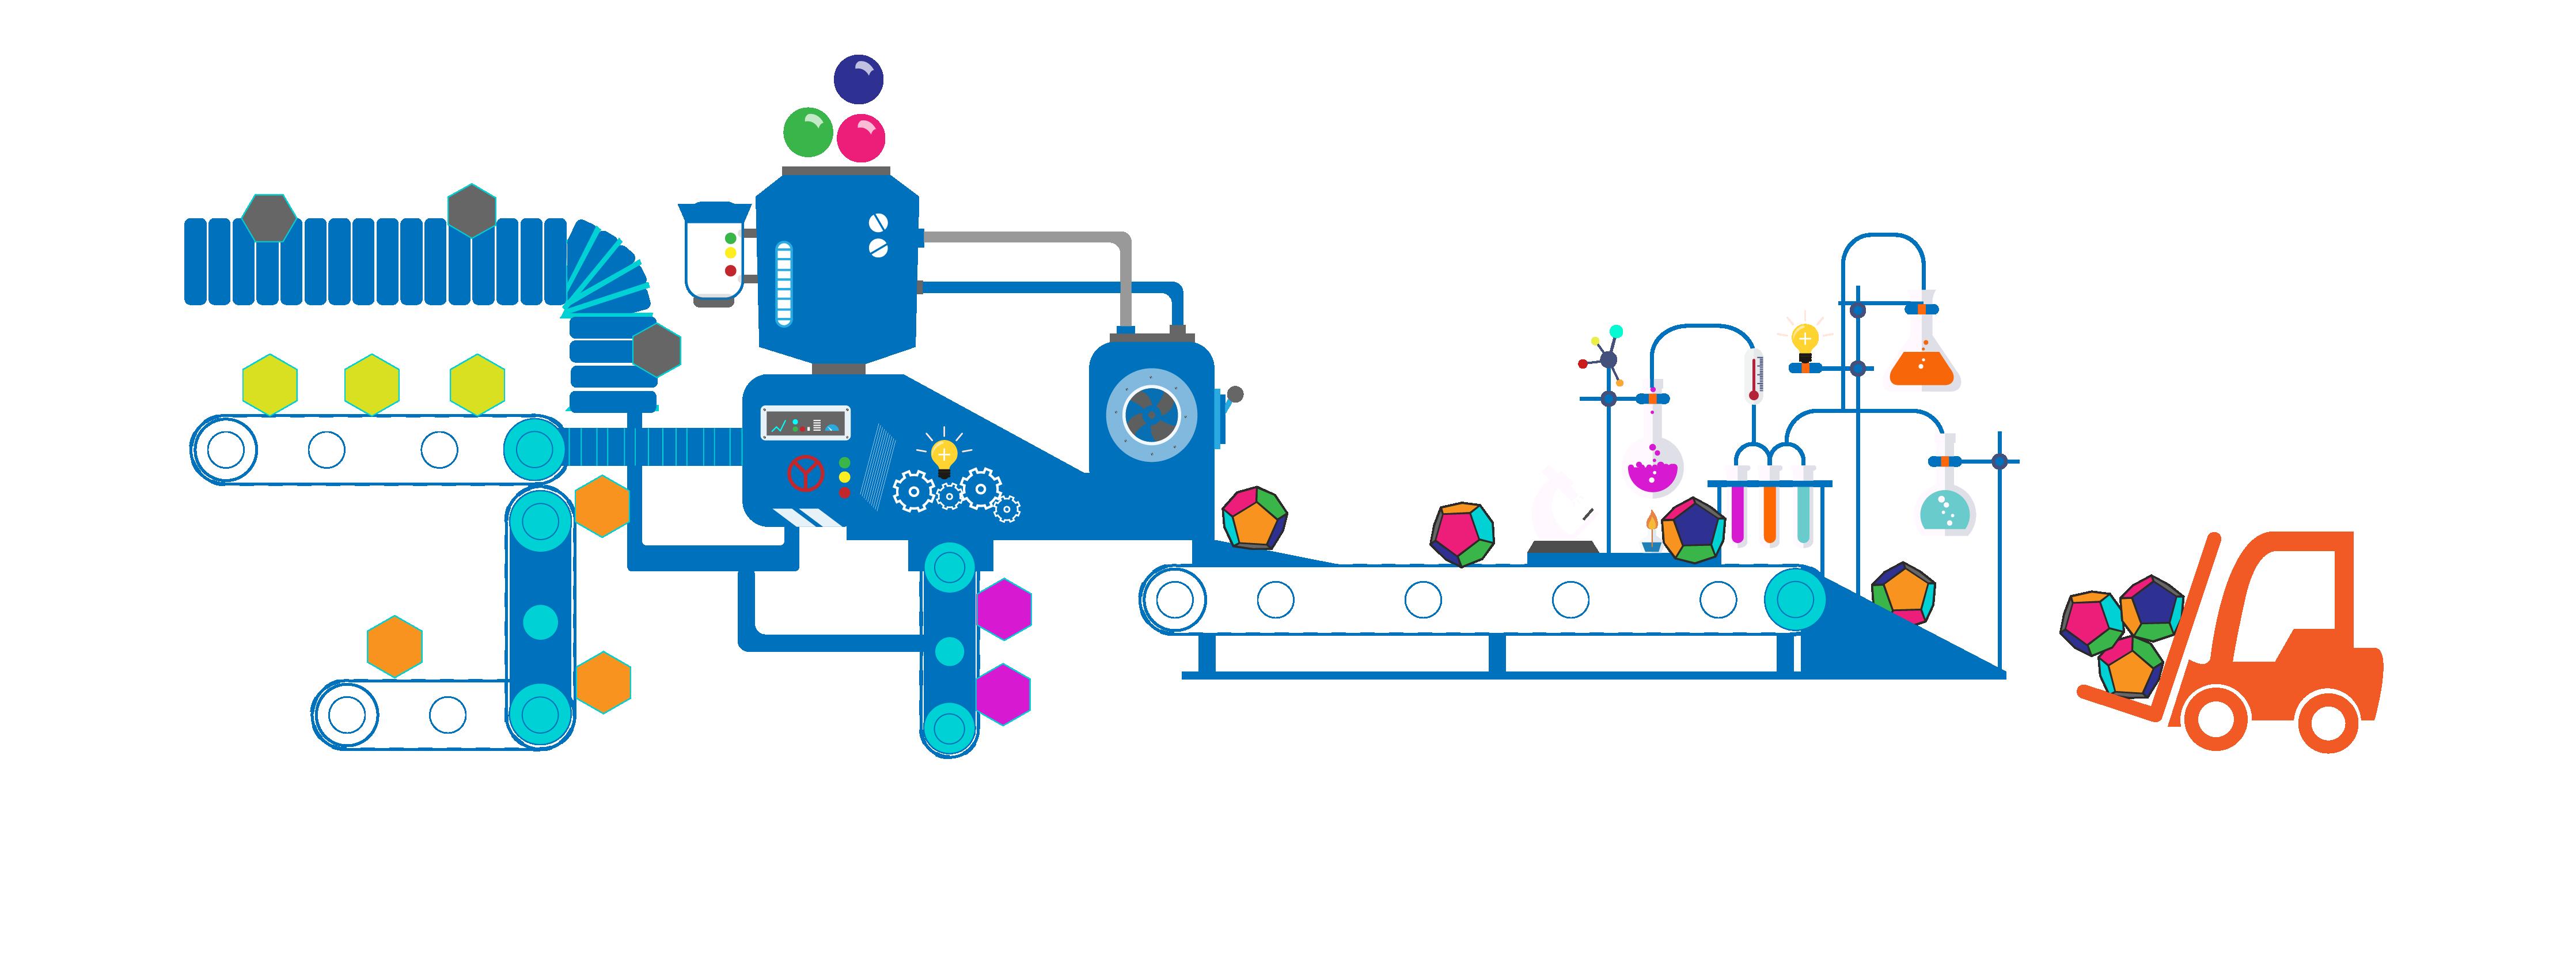 softwarefactory-2-01